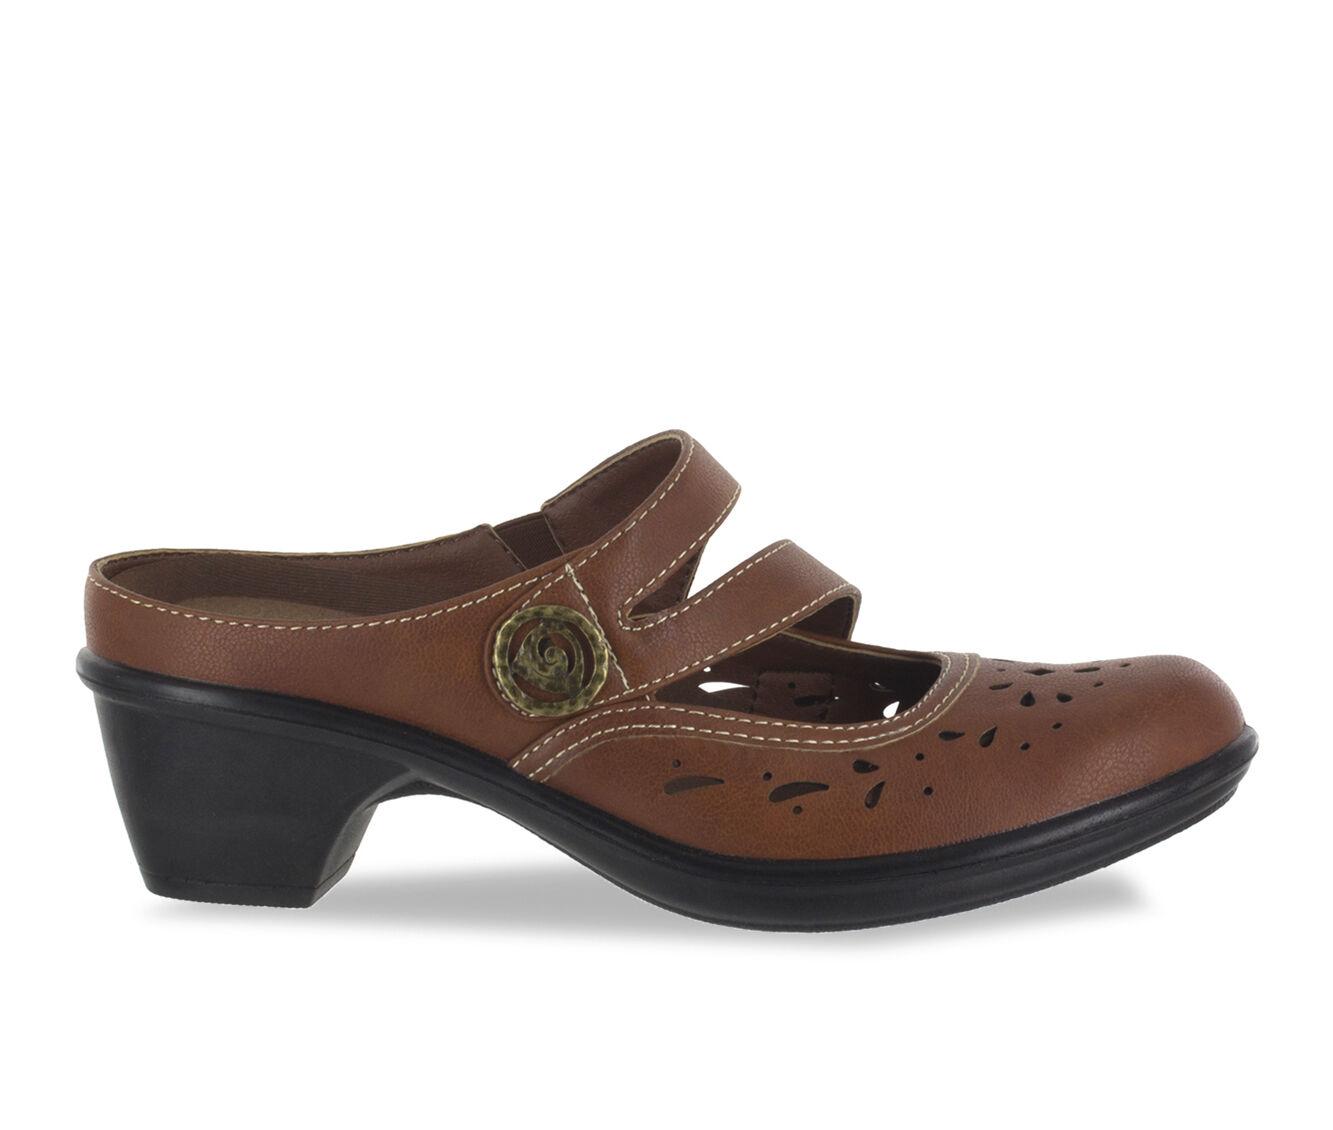 uk shoes_kd5835